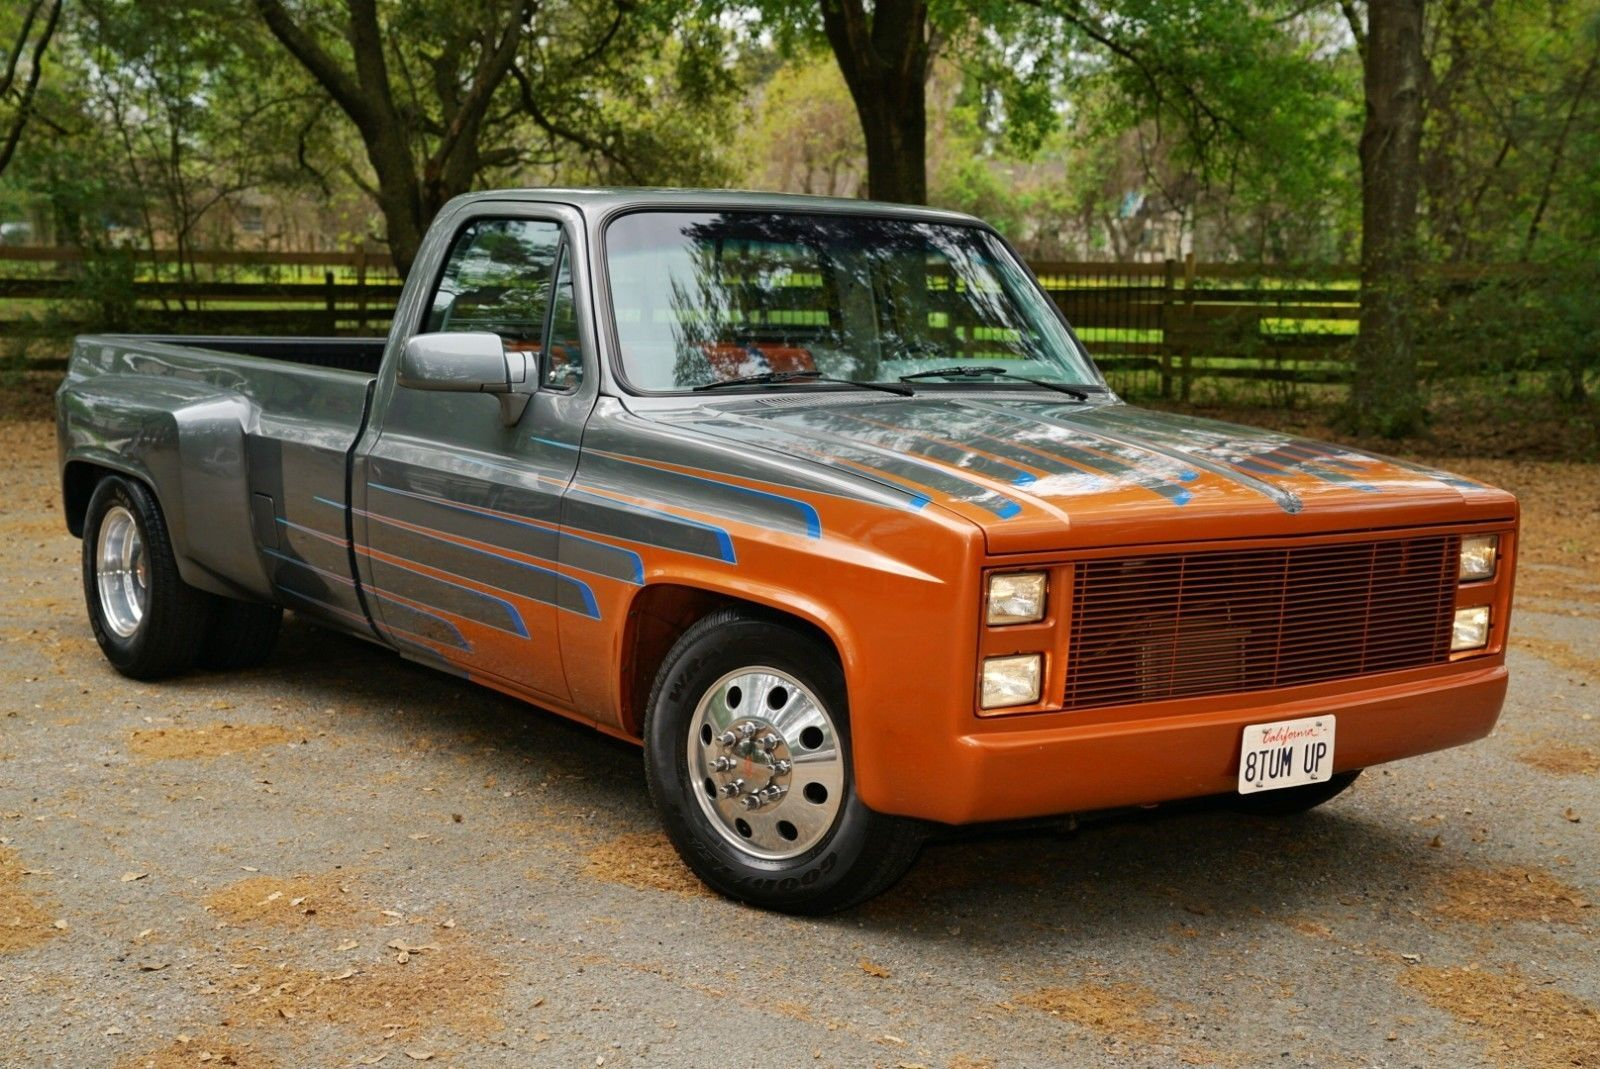 eBay 1973 Chevrolet C10 CK 3500 1973 CHEVROLET CK 3500